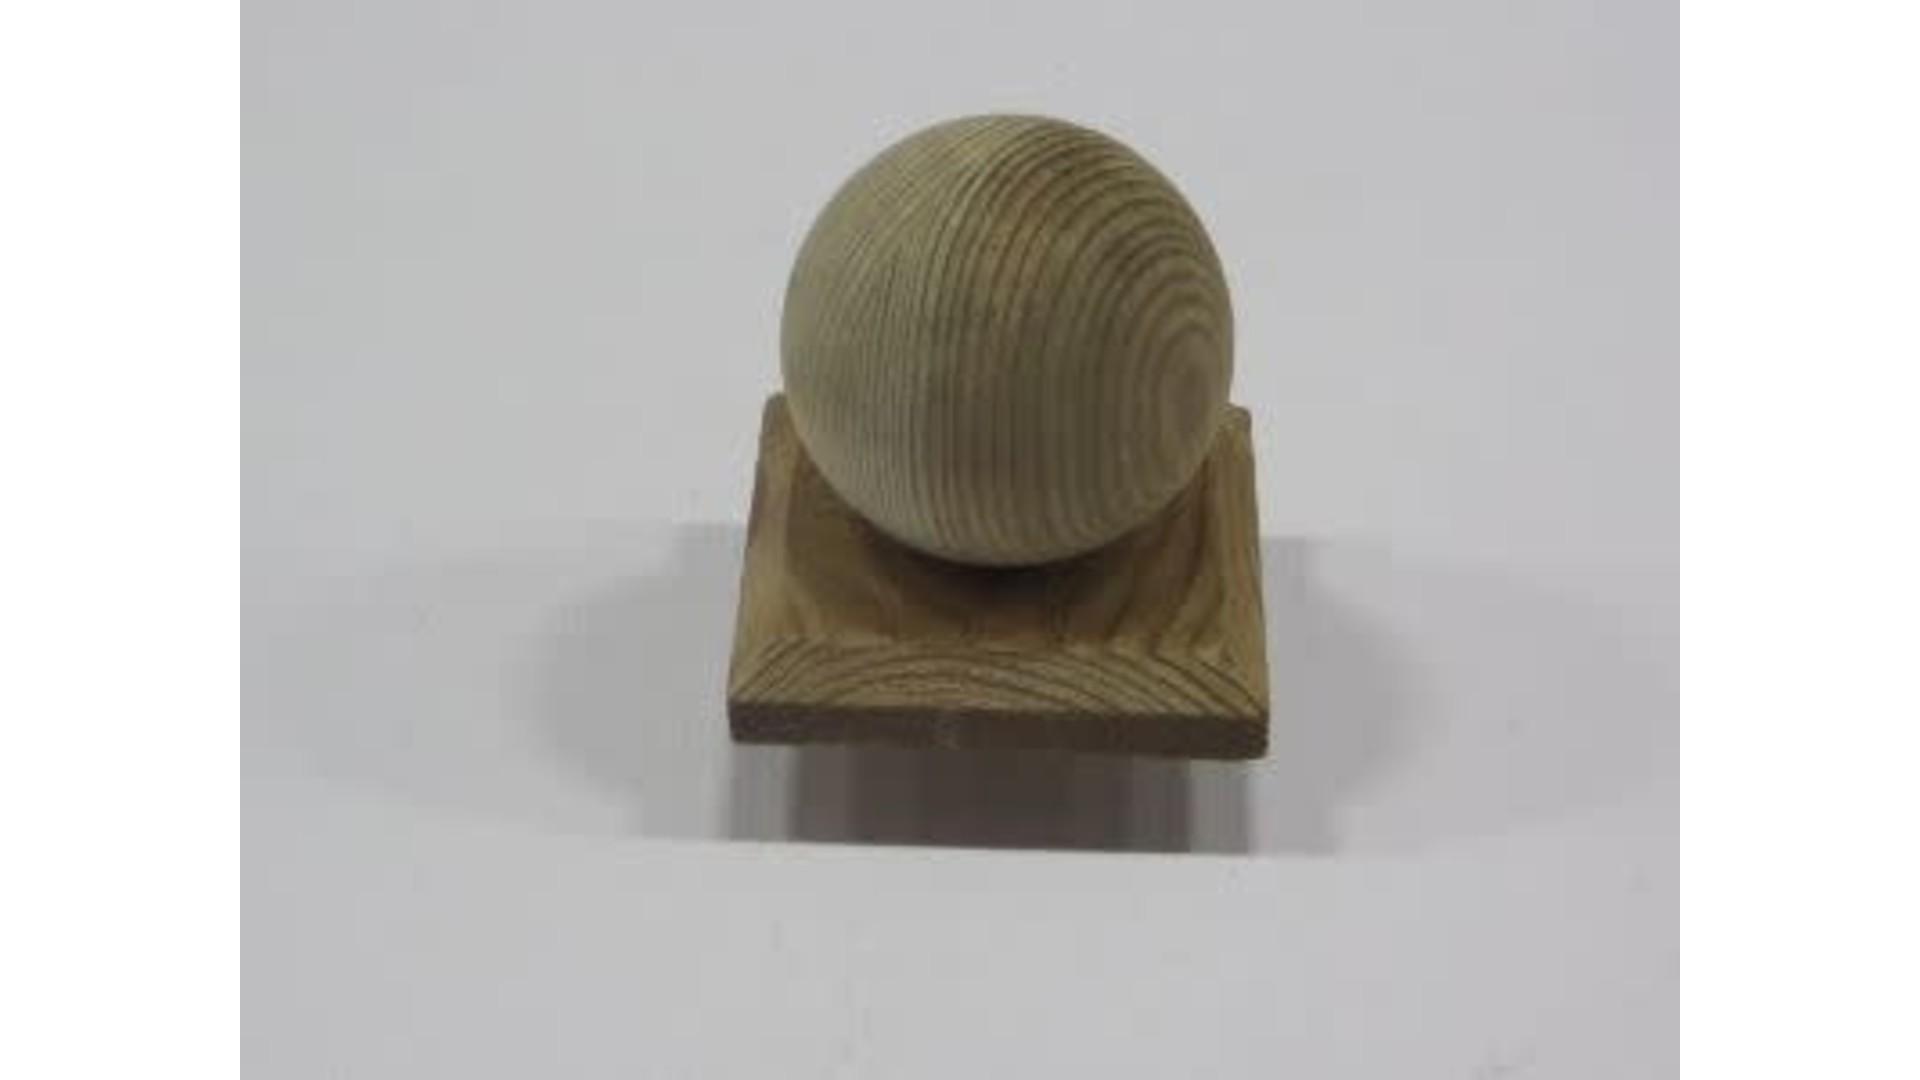 Paalkap 8x8 cm bol-hout